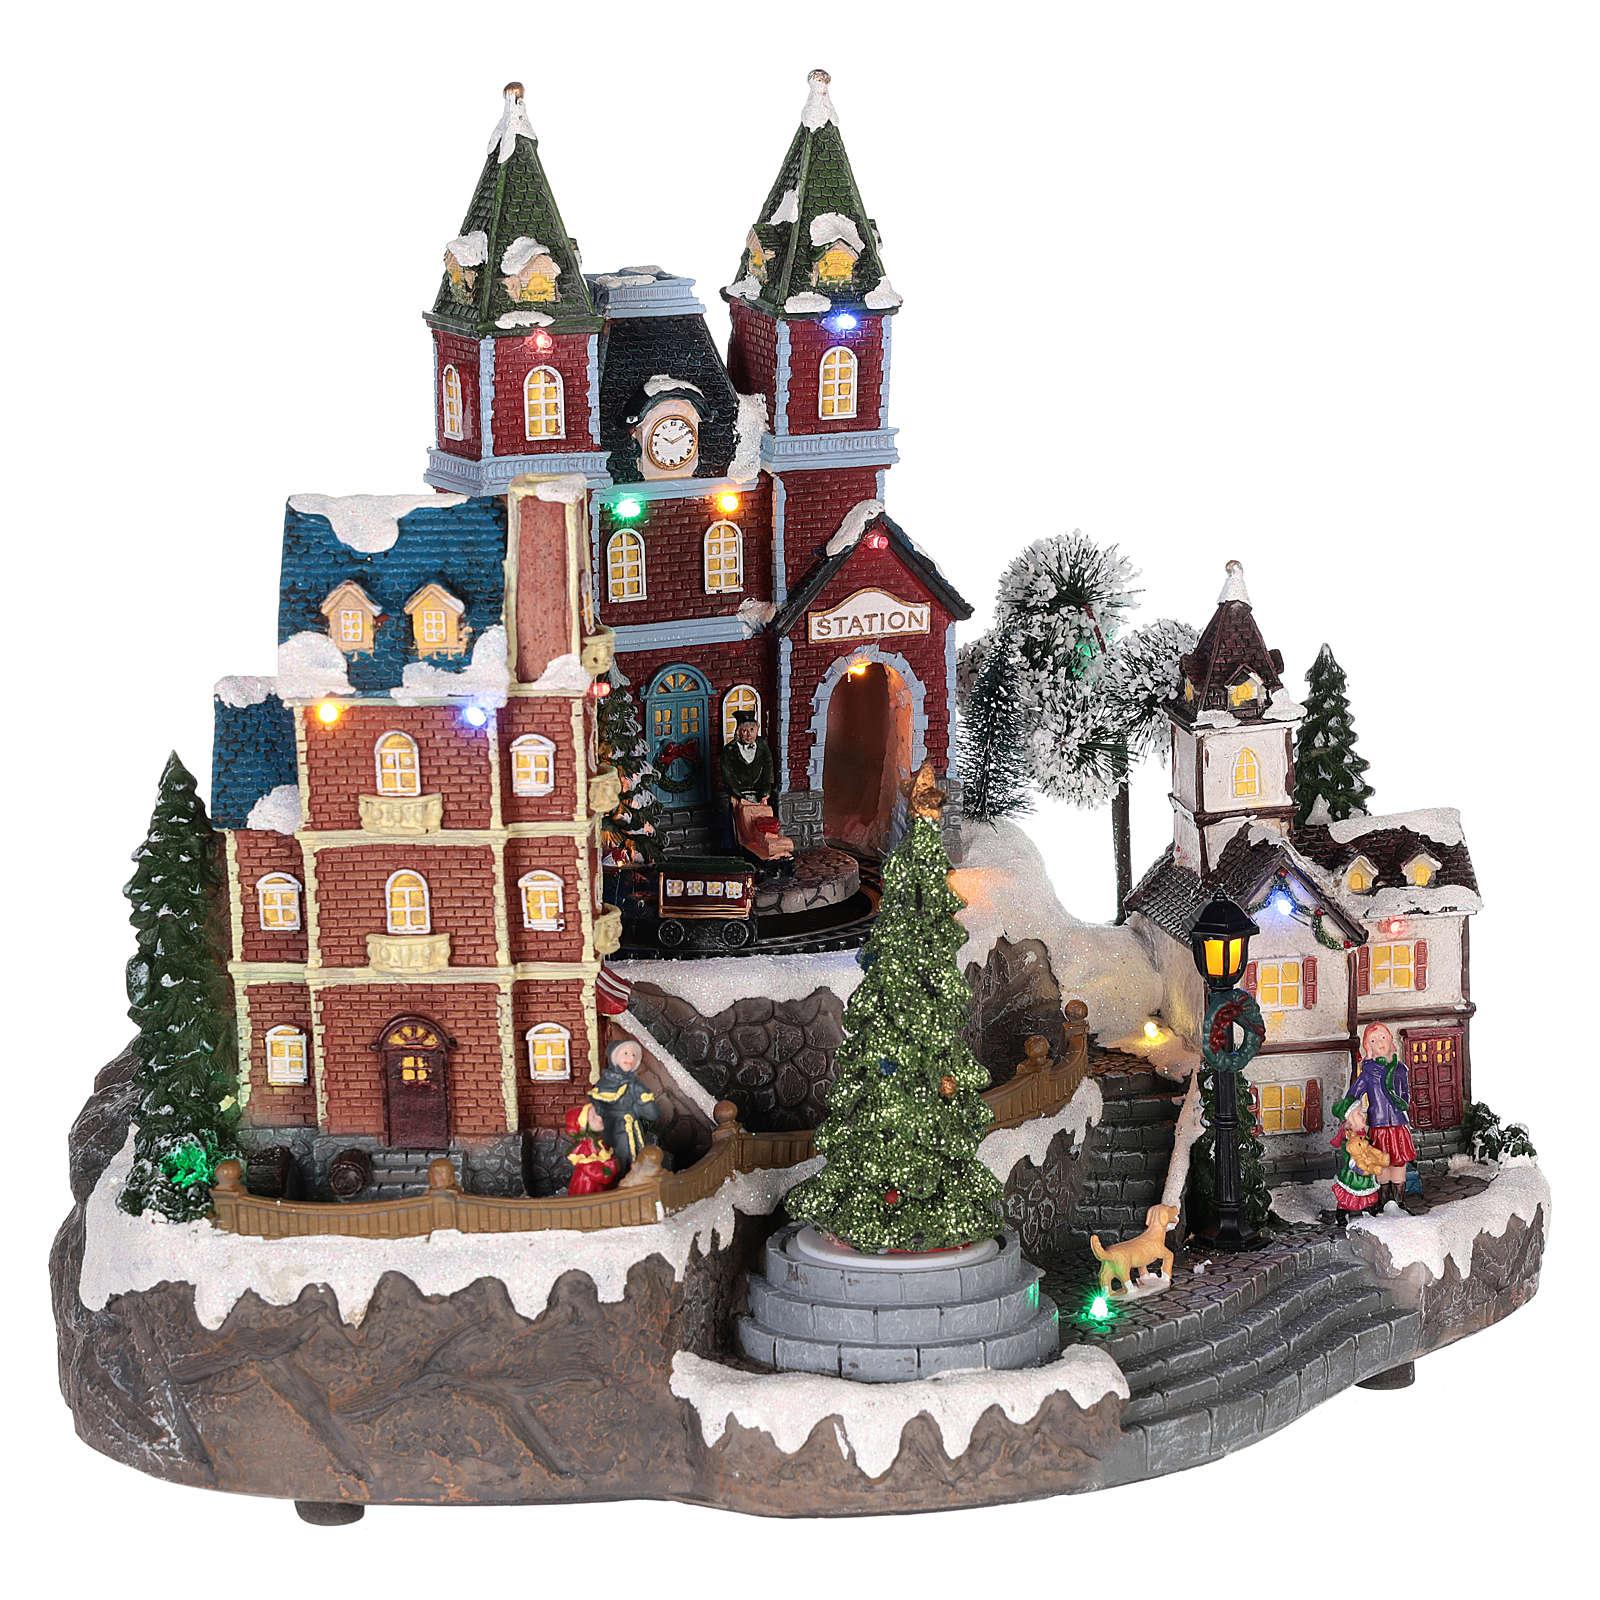 Christmas-themed train station 30x35x25 cm 3